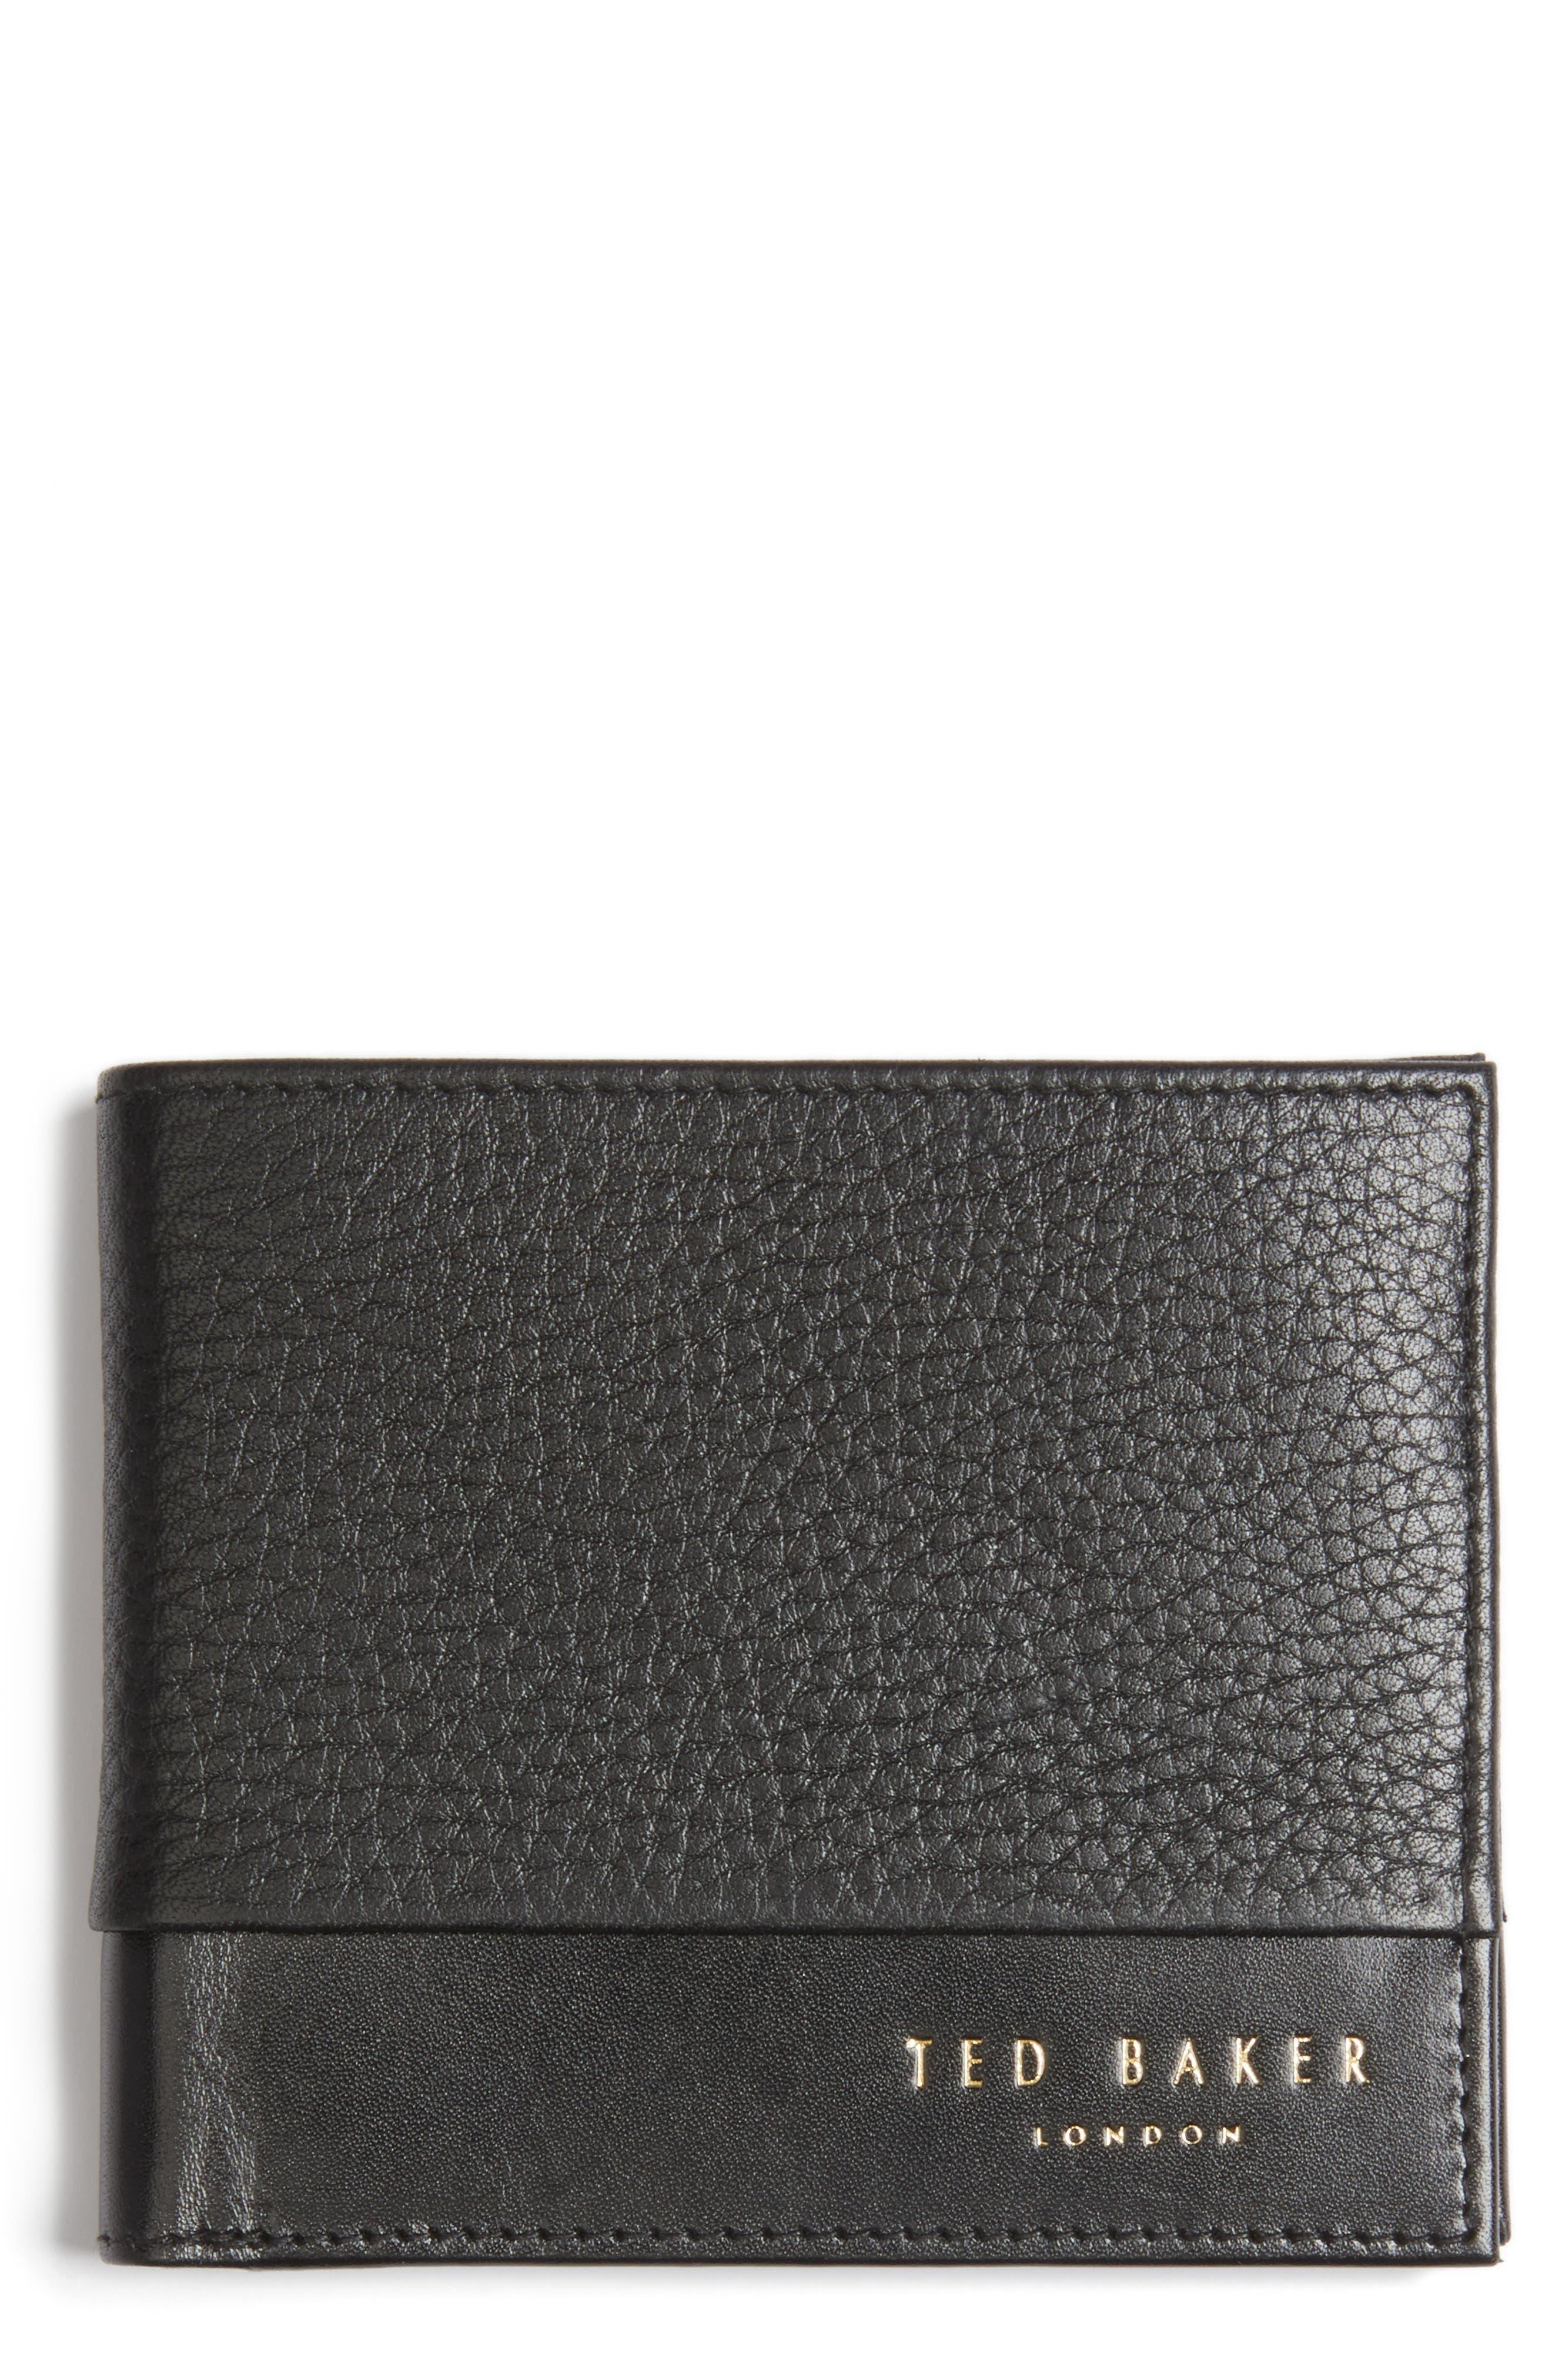 Mixdup Leather Wallet,                             Main thumbnail 1, color,